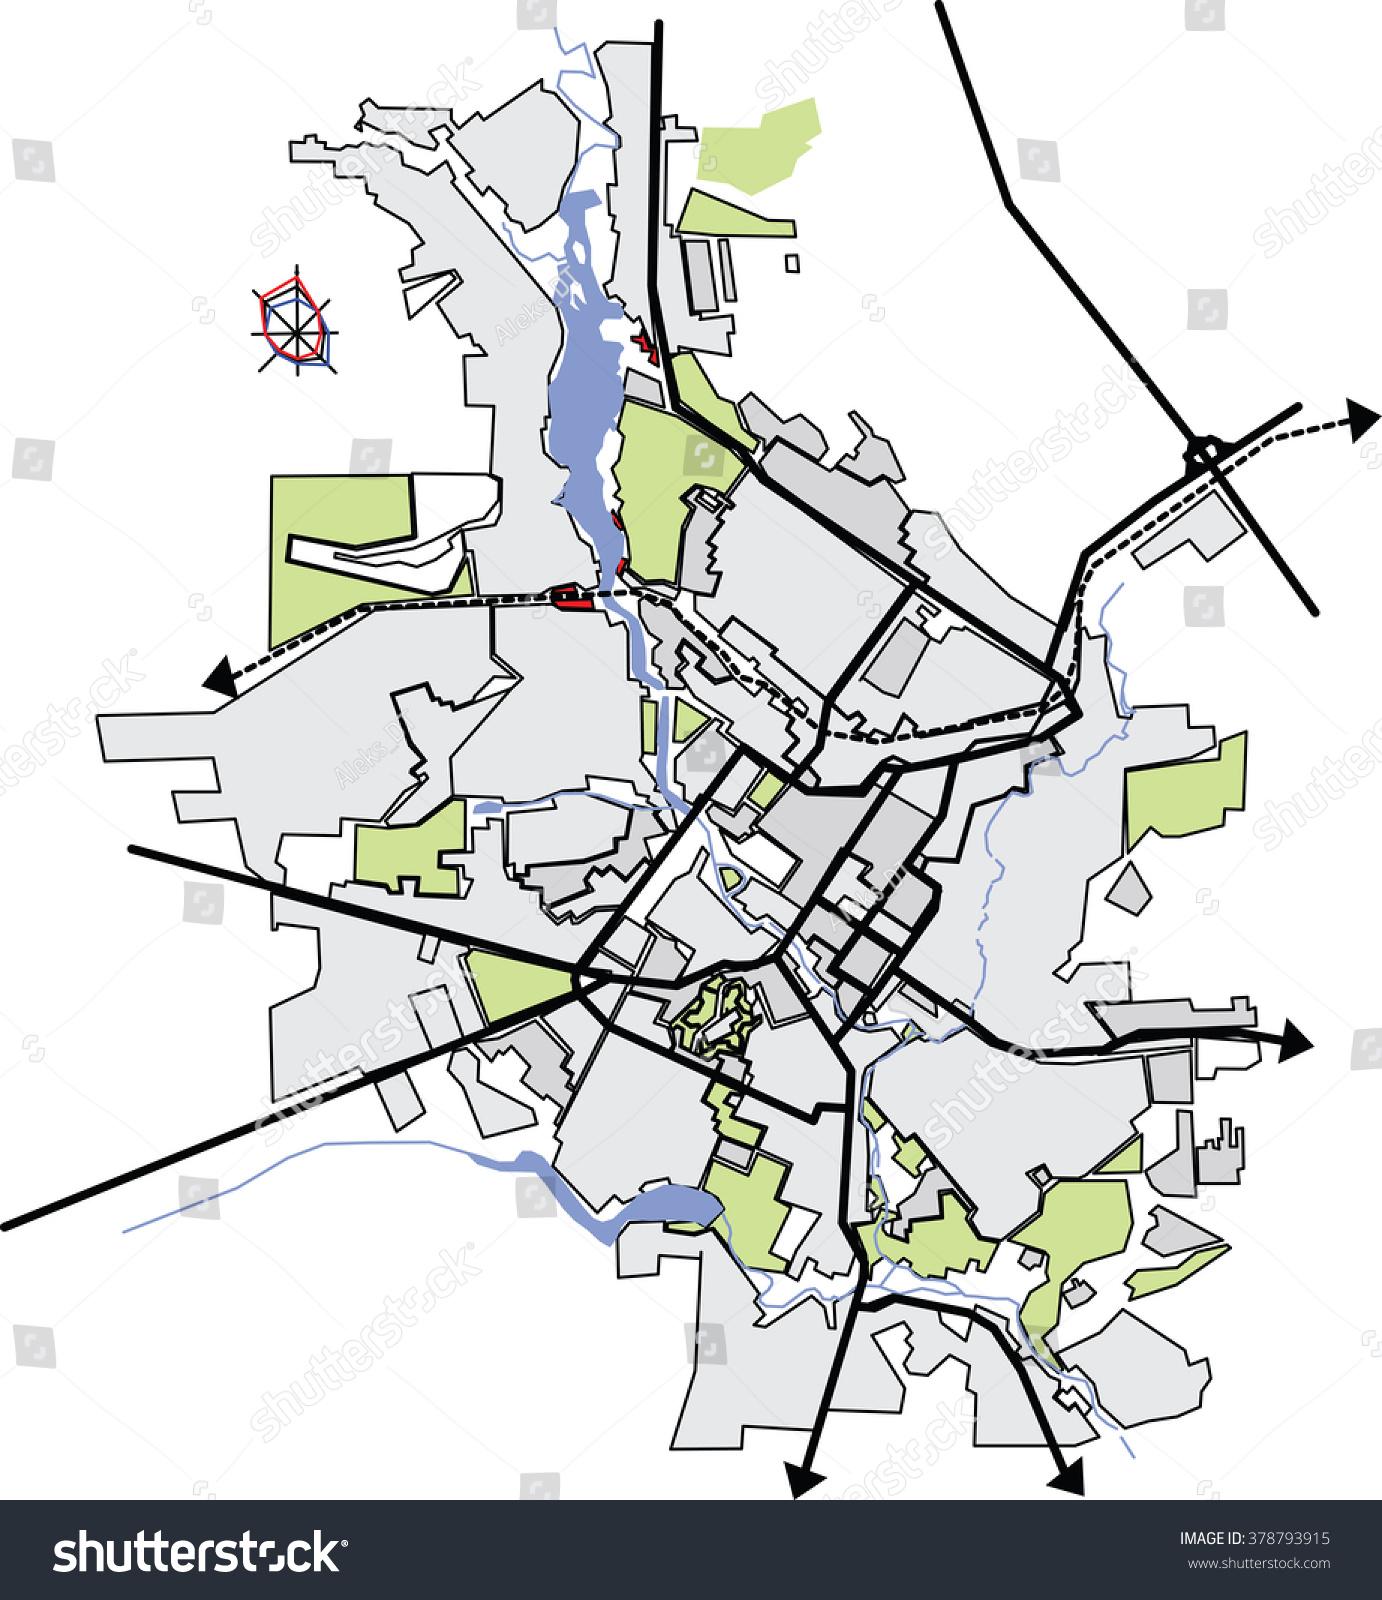 Kirovograd region: a selection of sites